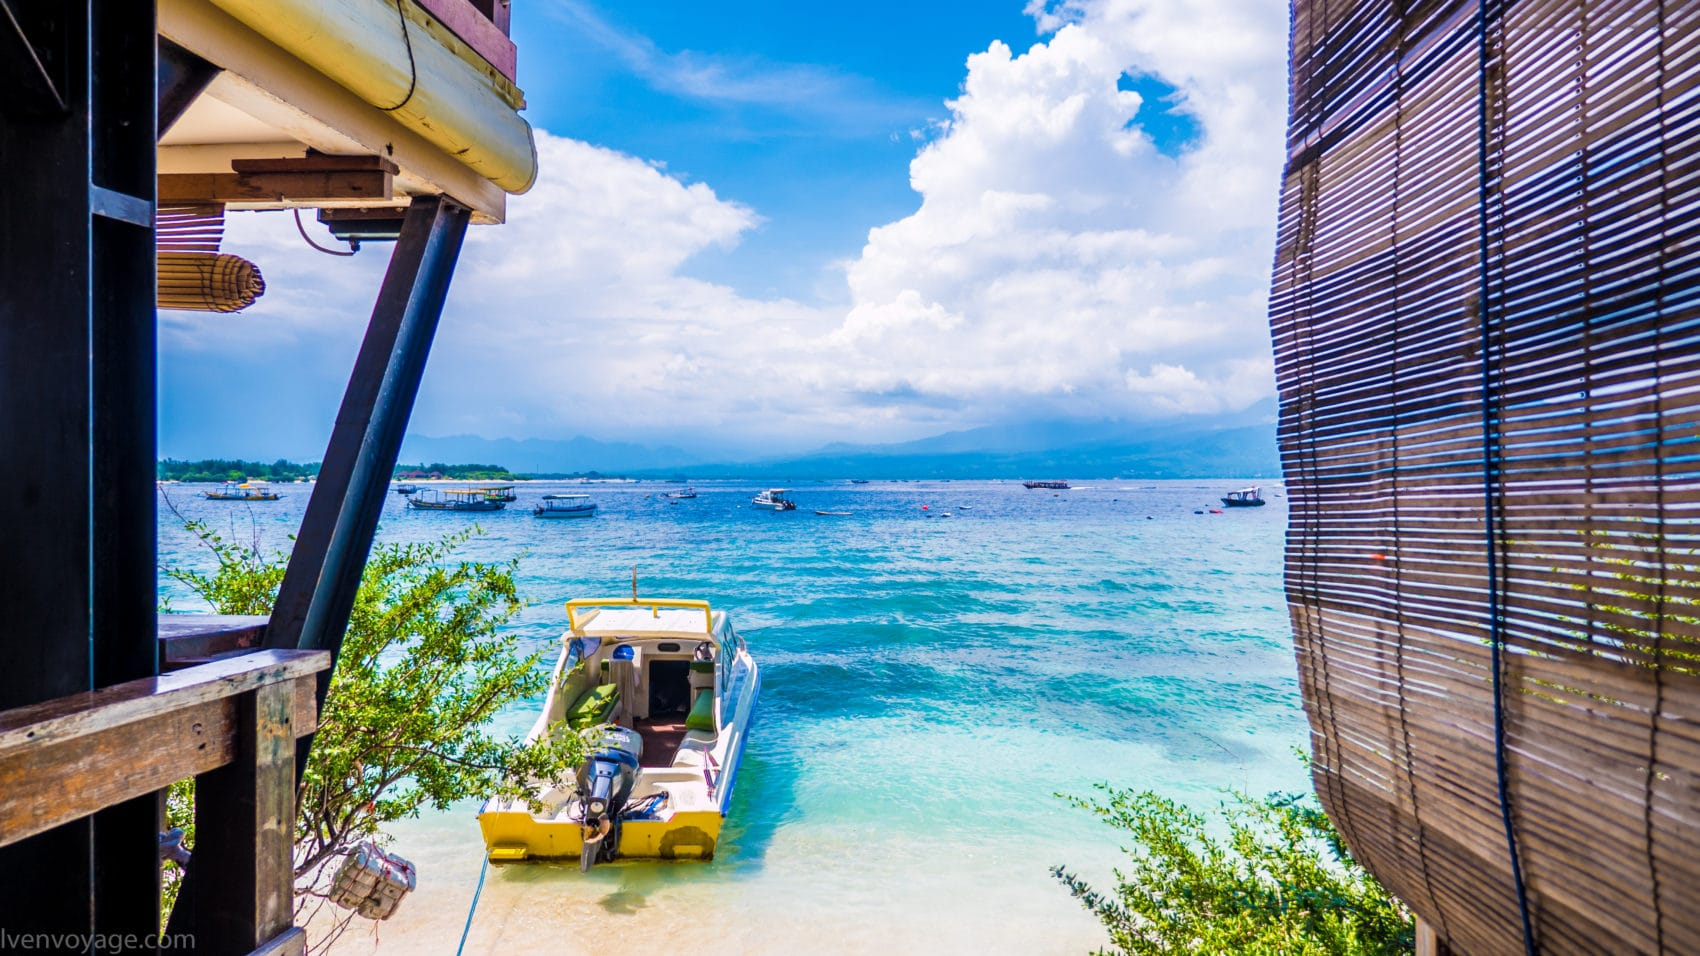 Vue sur mer GILI TRAWANGAN INDONESIE